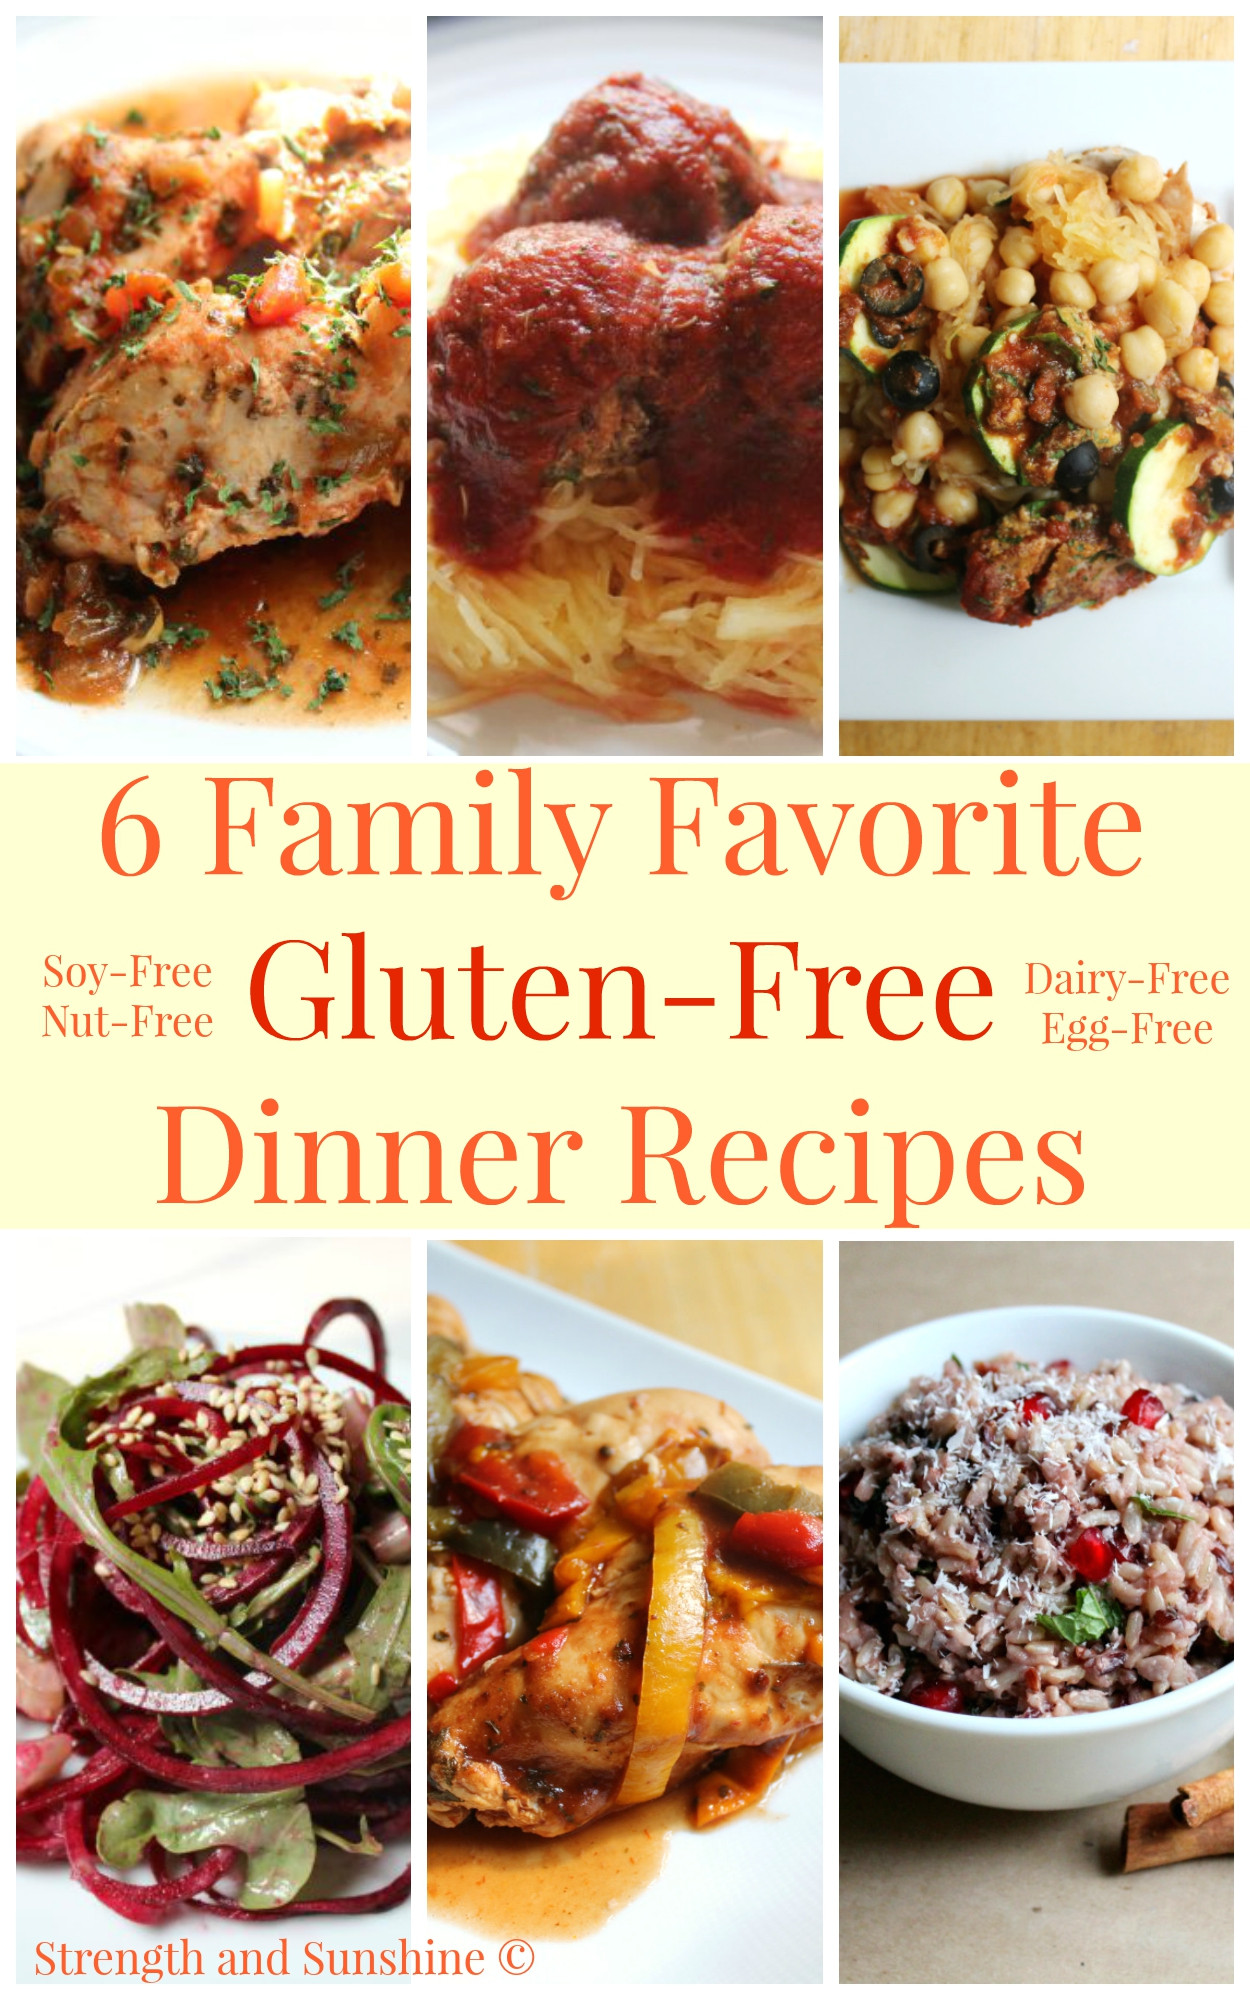 Gluten Free Dairy Free Corn Free Dinner Recipes  6 Family Favorite Gluten Free Dinner Recipes